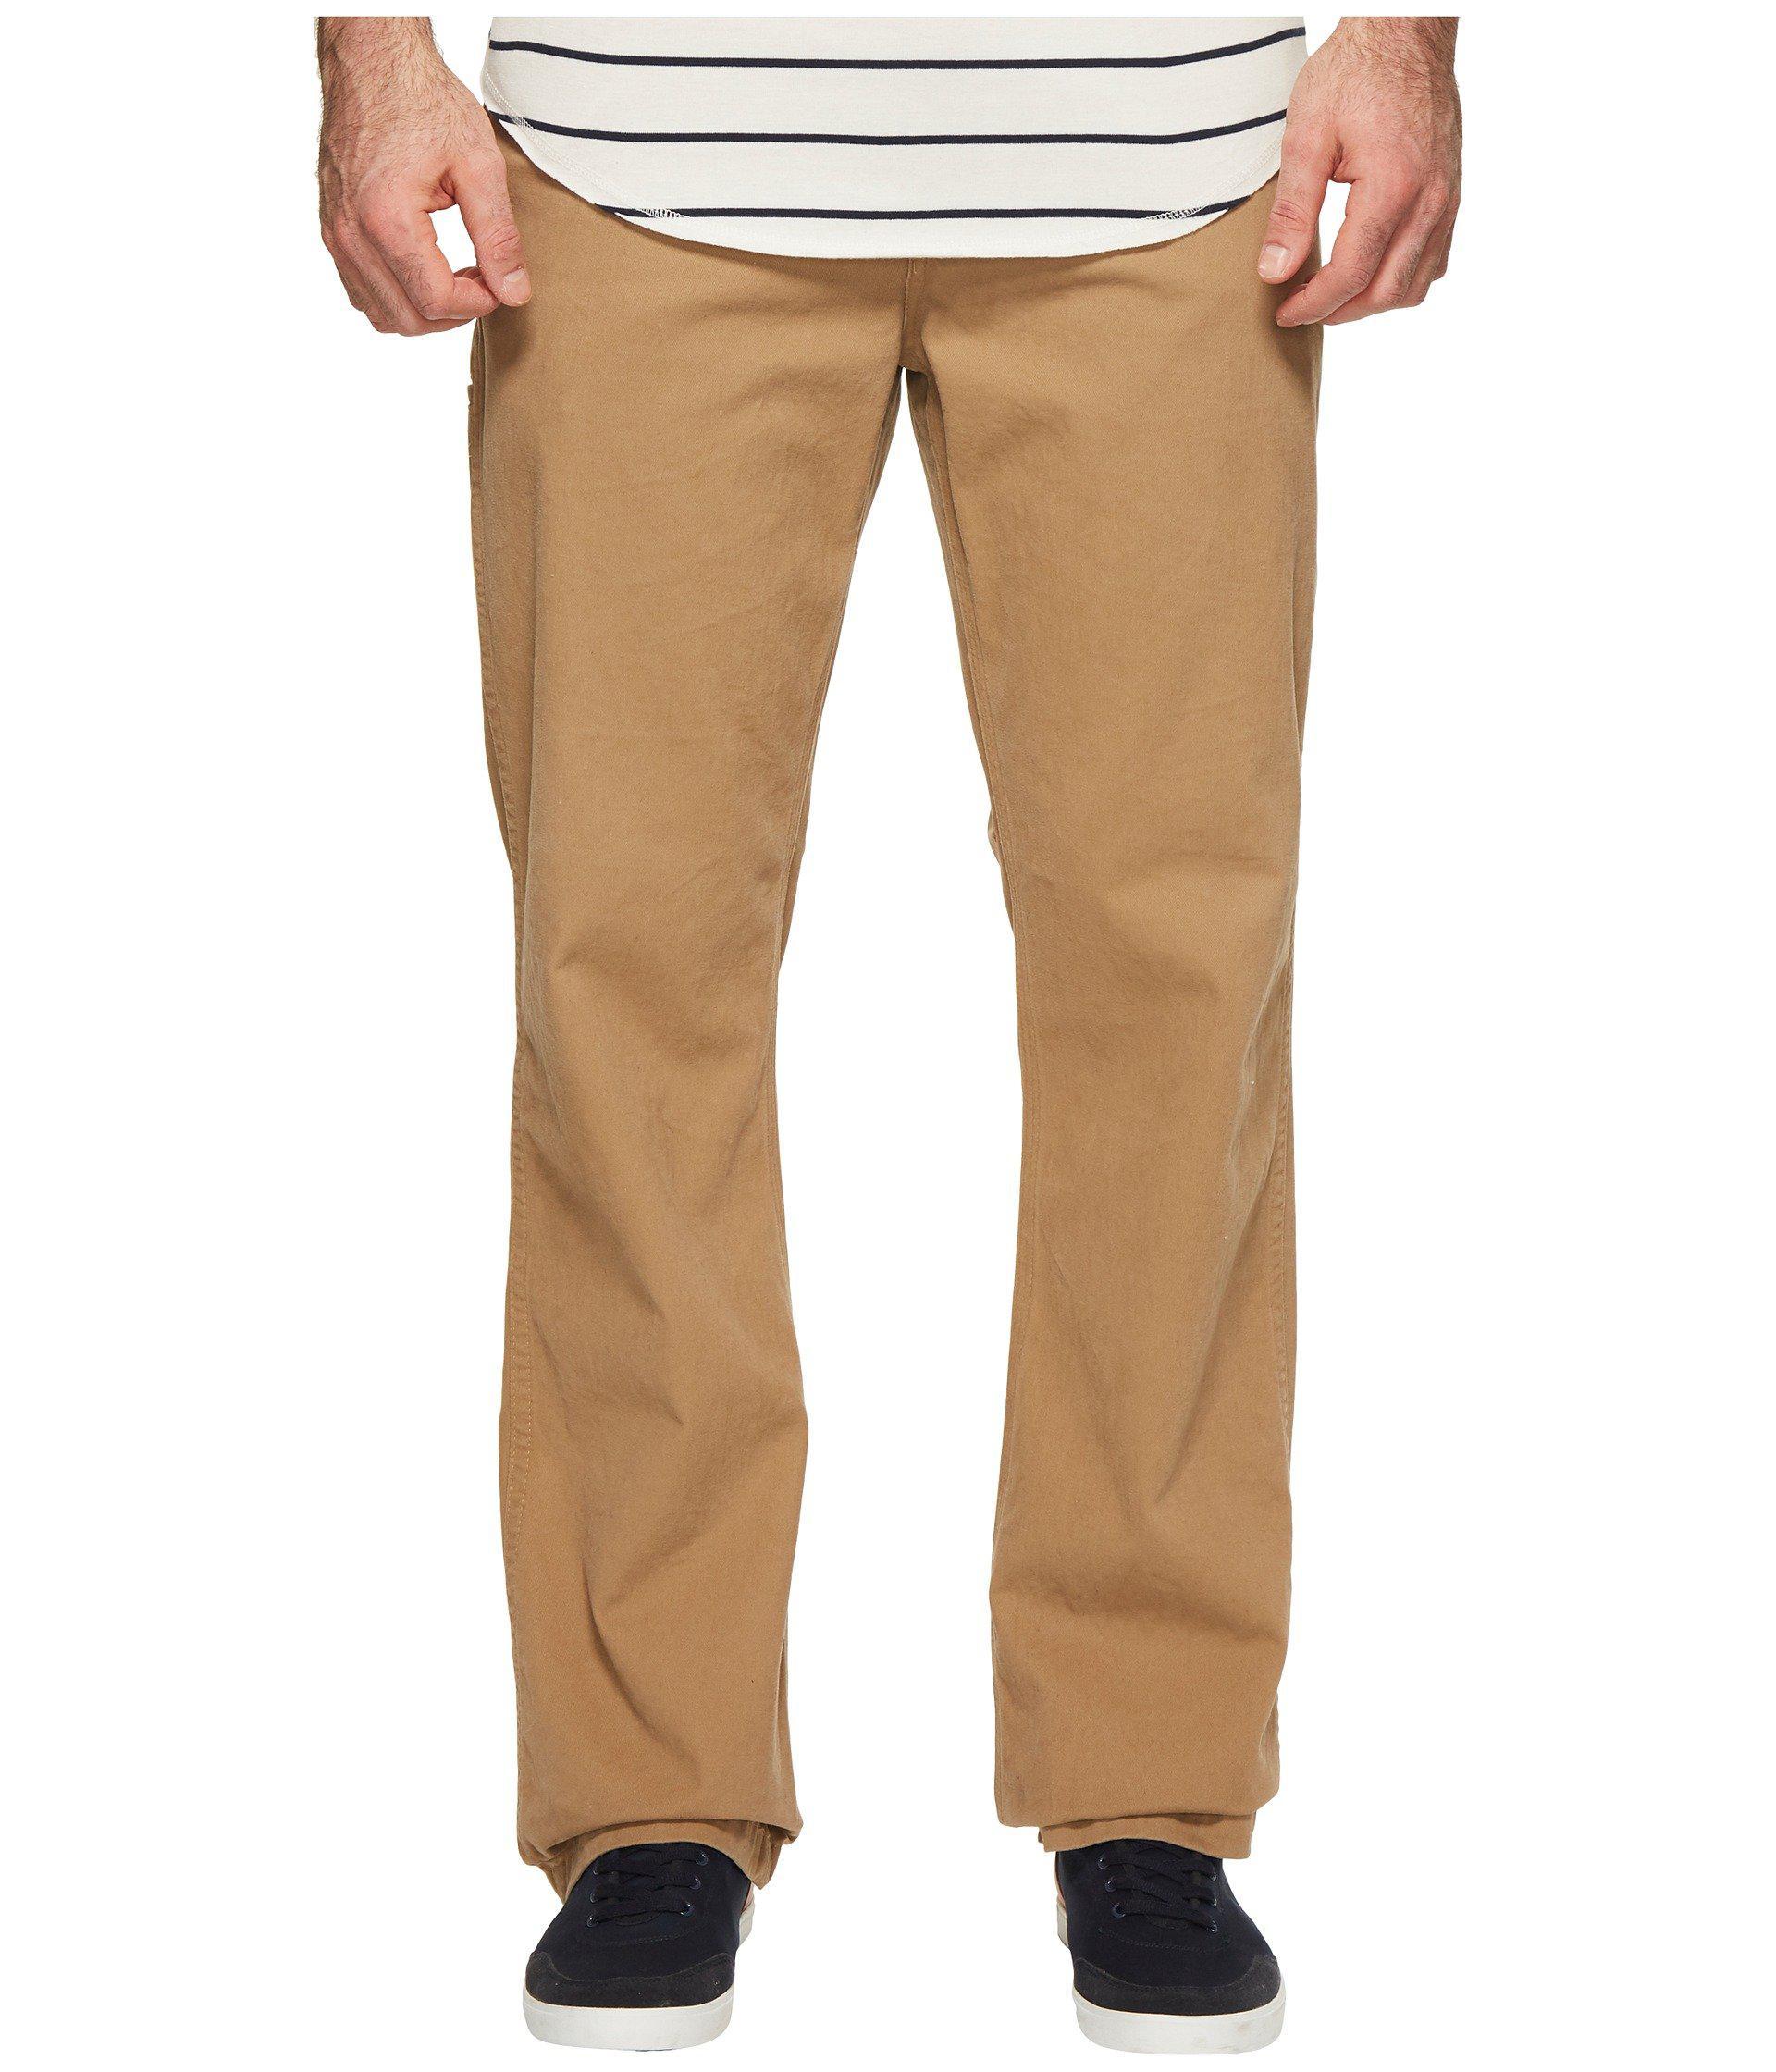 76c1d502 Polo Ralph Lauren Mens Twill Flat Front Khaki Chino Shorts